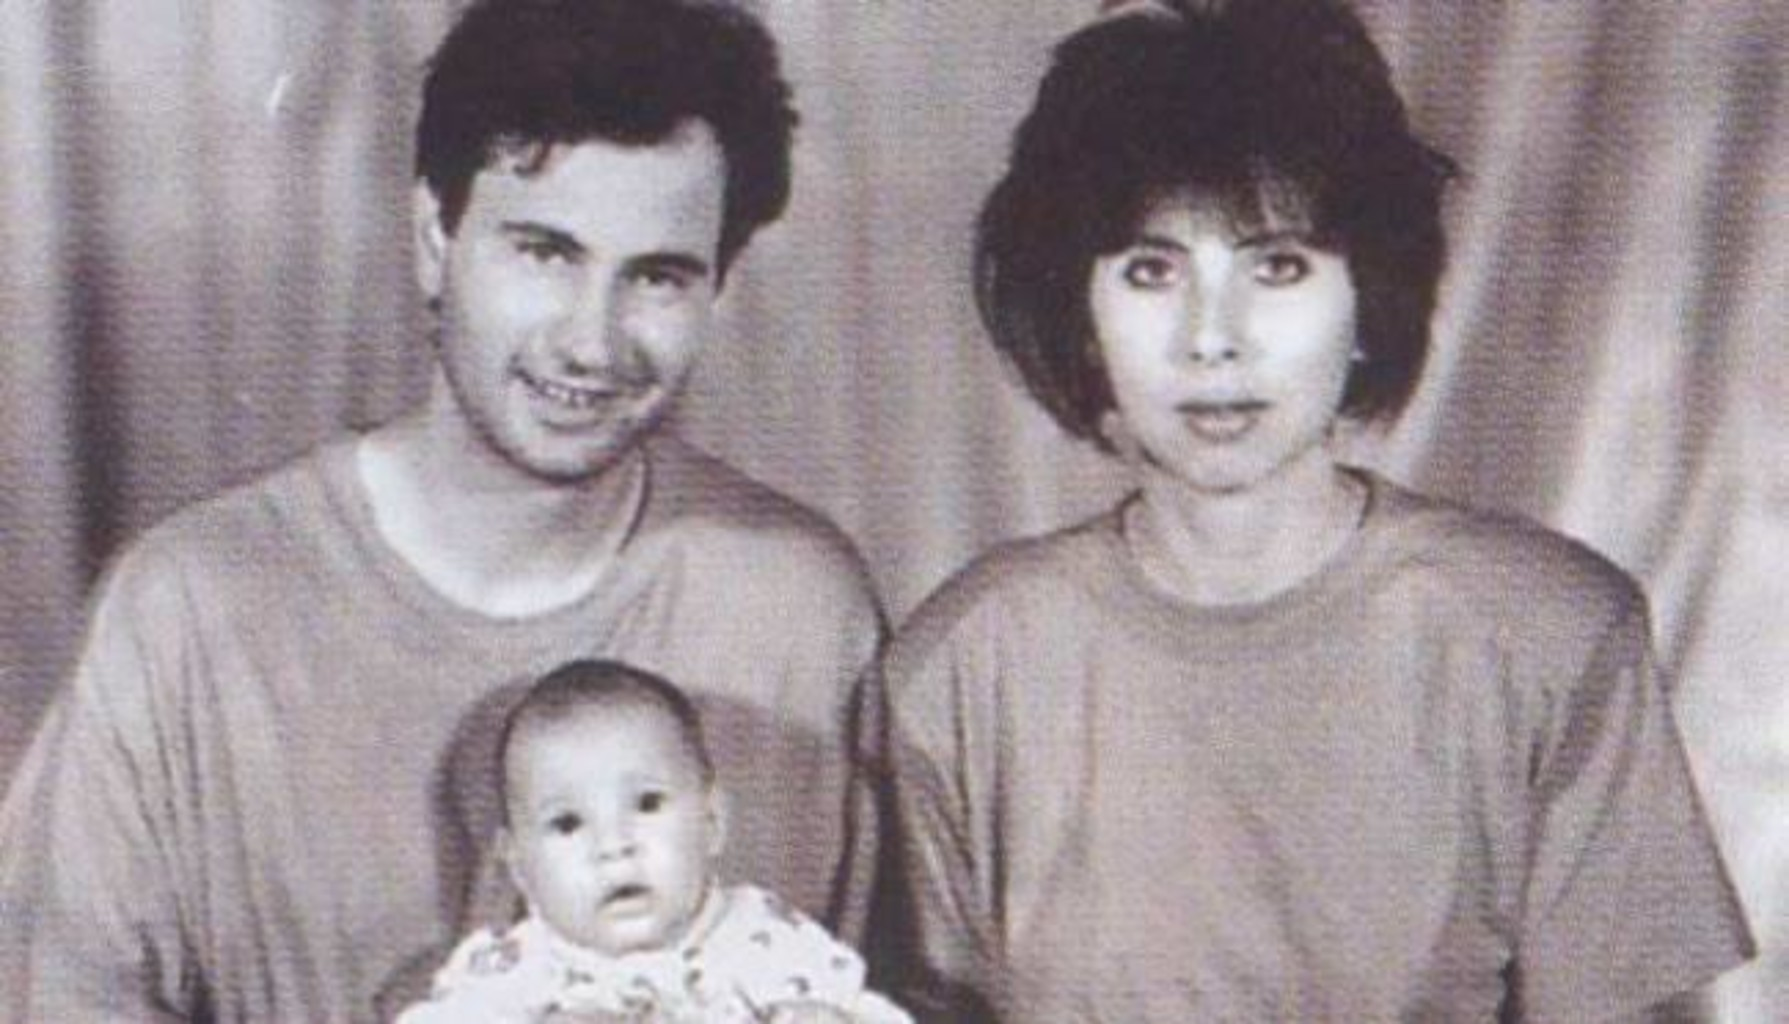 Экс-супруга Валерия Меладзе призналась, что стала счастливее после развода с ним